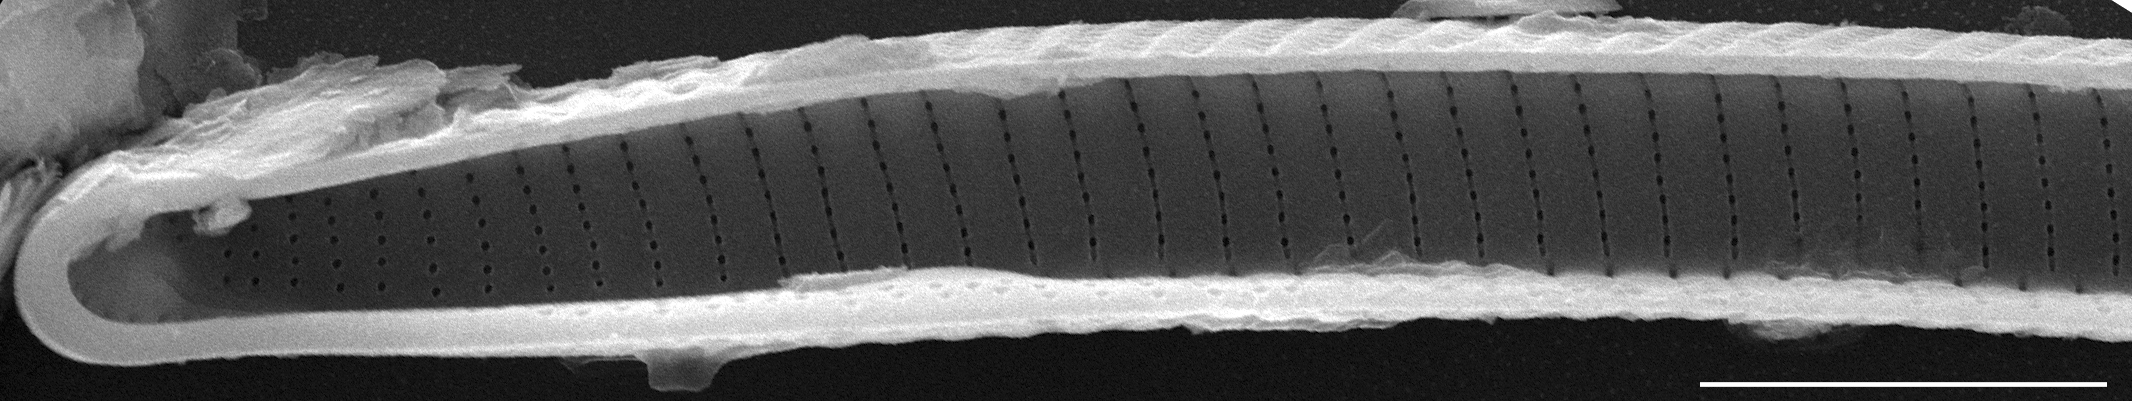 Eunotia obliquestriata SEM2